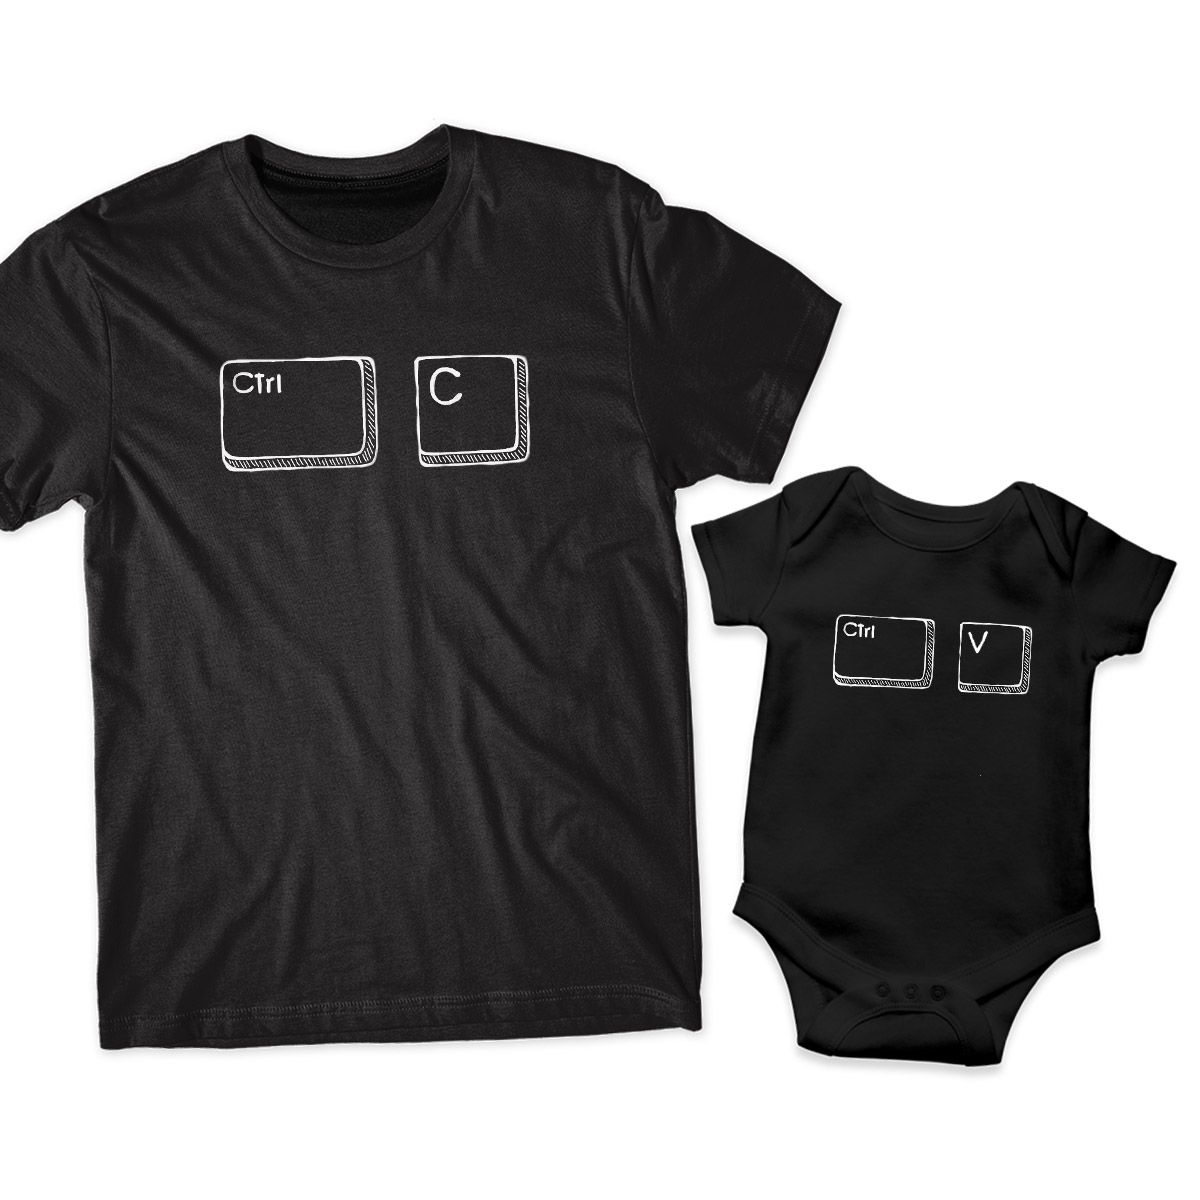 camiseta tal pai tal filho control c control v